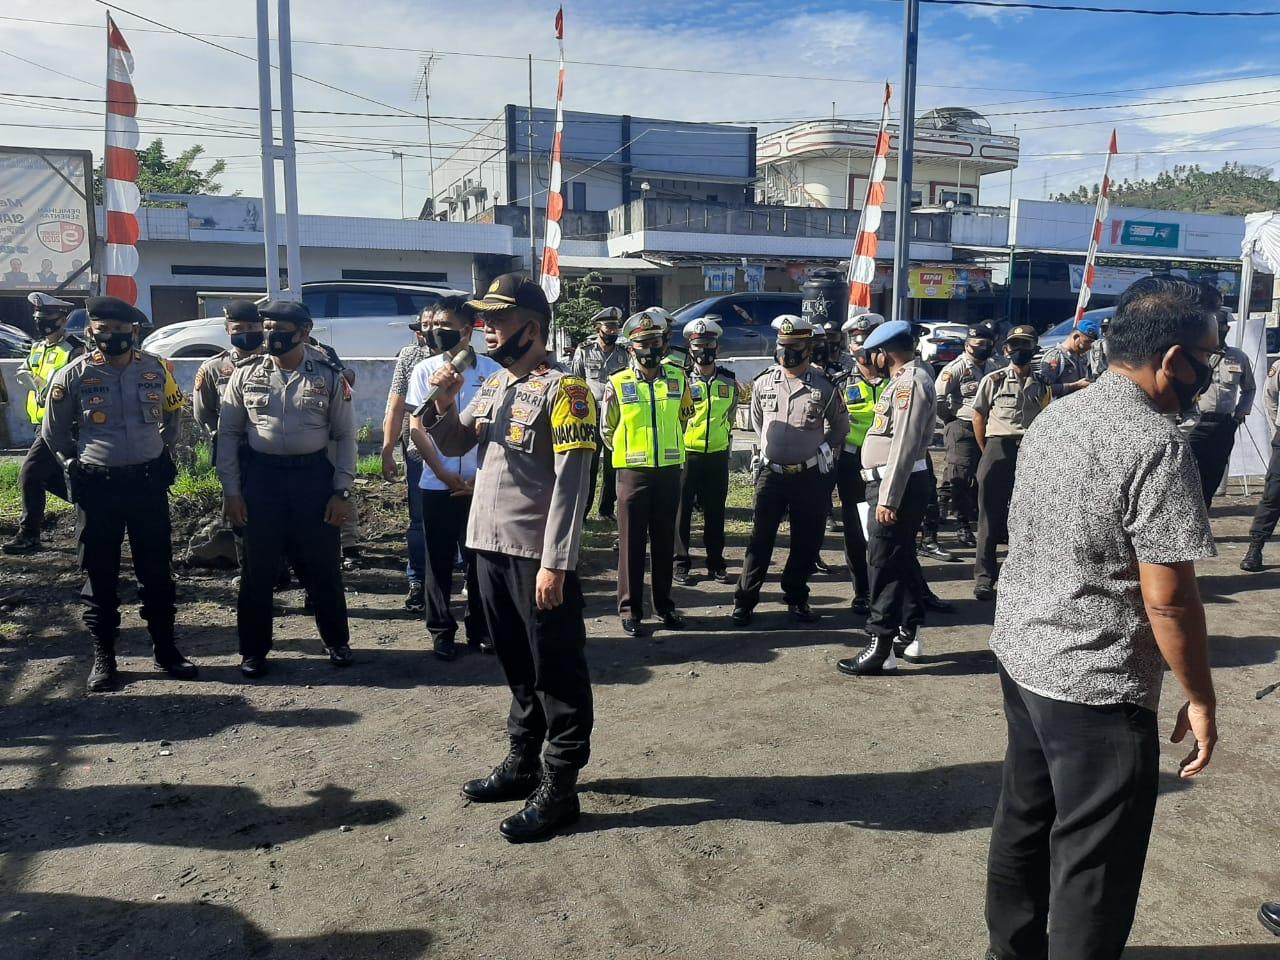 Ratusan personel Polres Minsel digeser ke KPU, Dalam Tahapan Pendaftaran Pilkada 2020